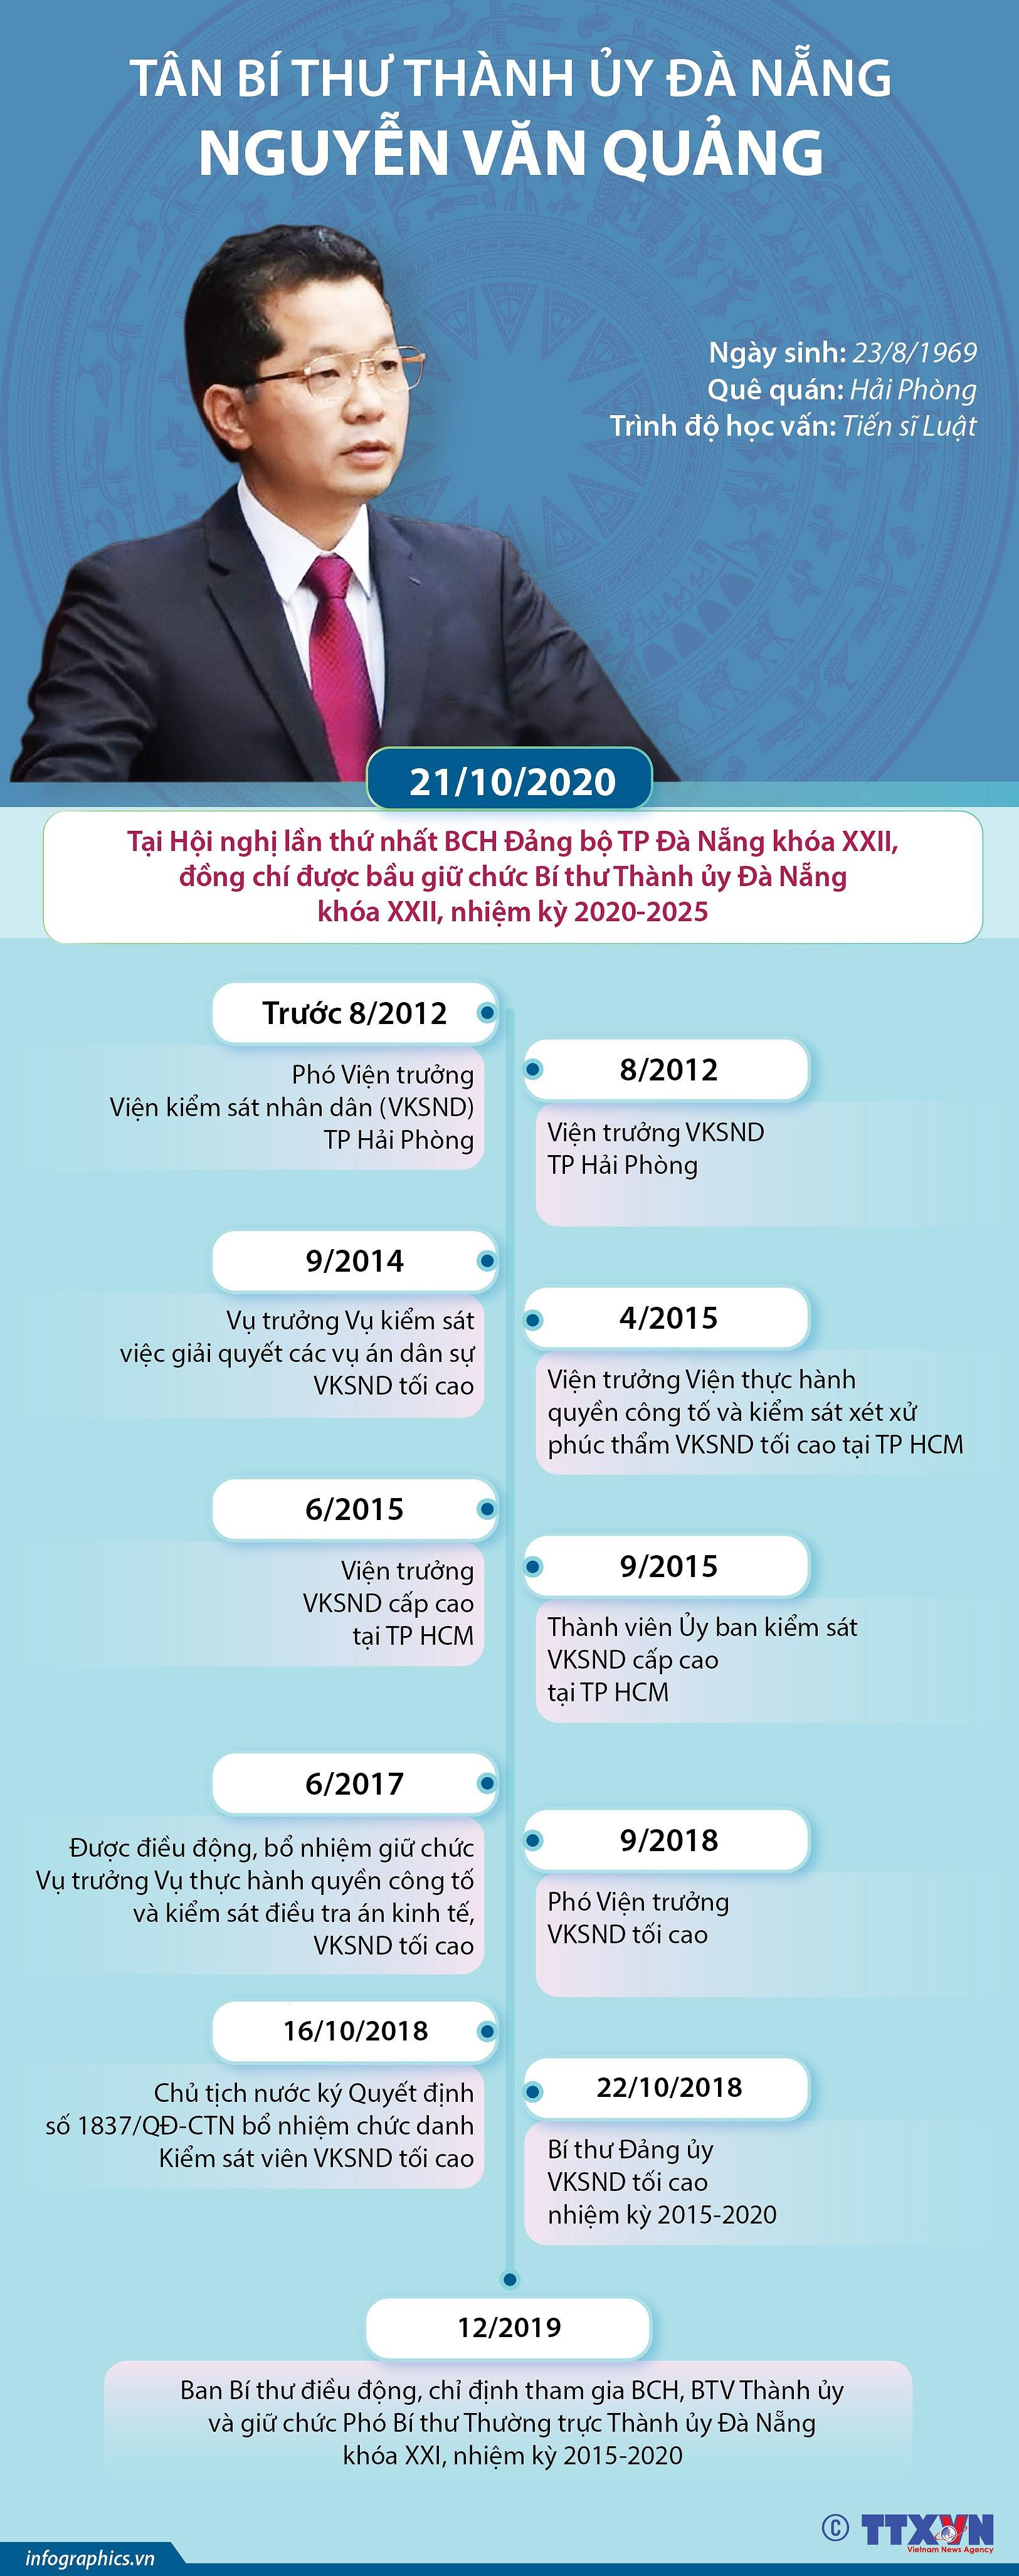 [Infographics] Tan Bi thu Thanh uy Da Nang Nguyen Van Quang hinh anh 1